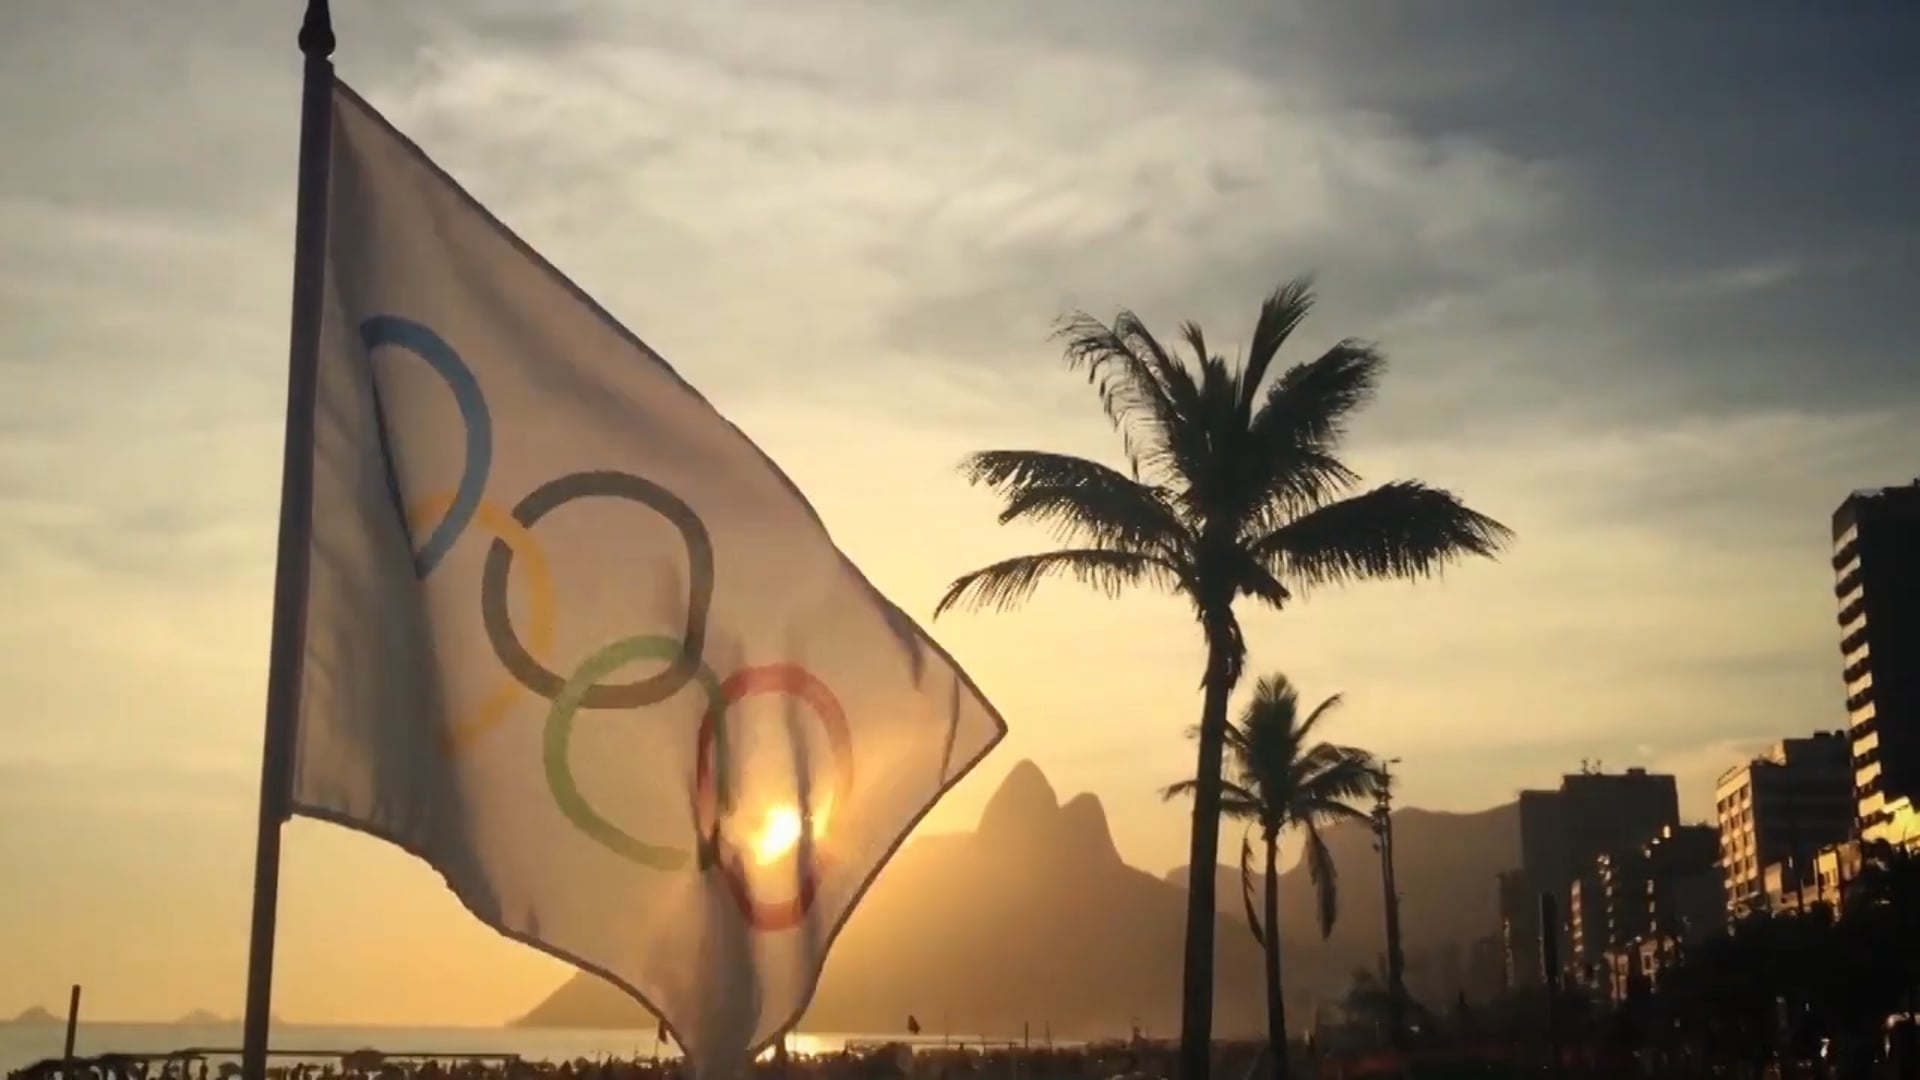 GE - Rio2016